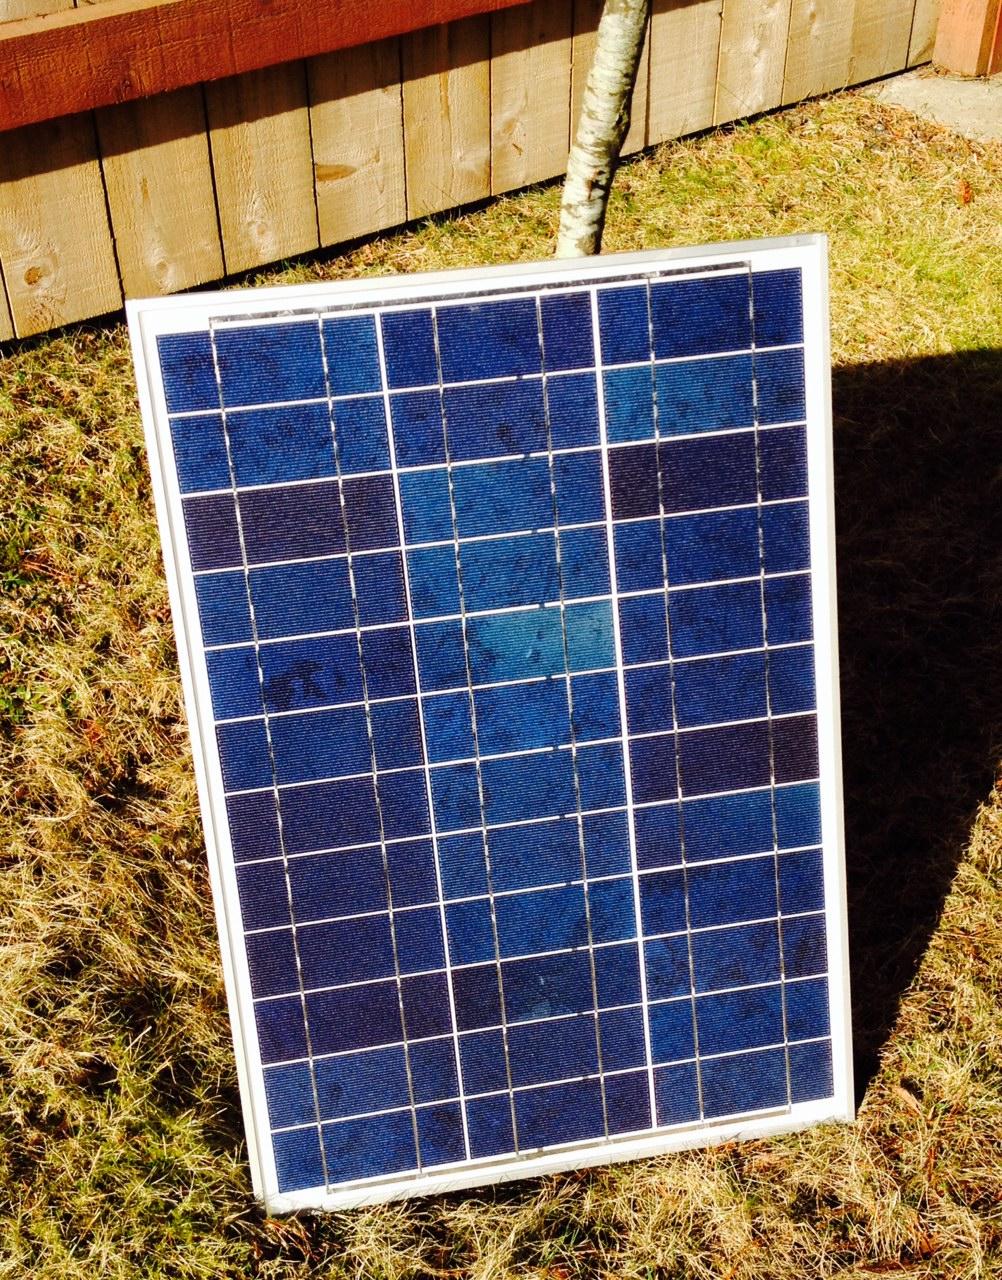 50-watt-solar-panel-vancouver-island-bc-canada-15393-zoom.jpg